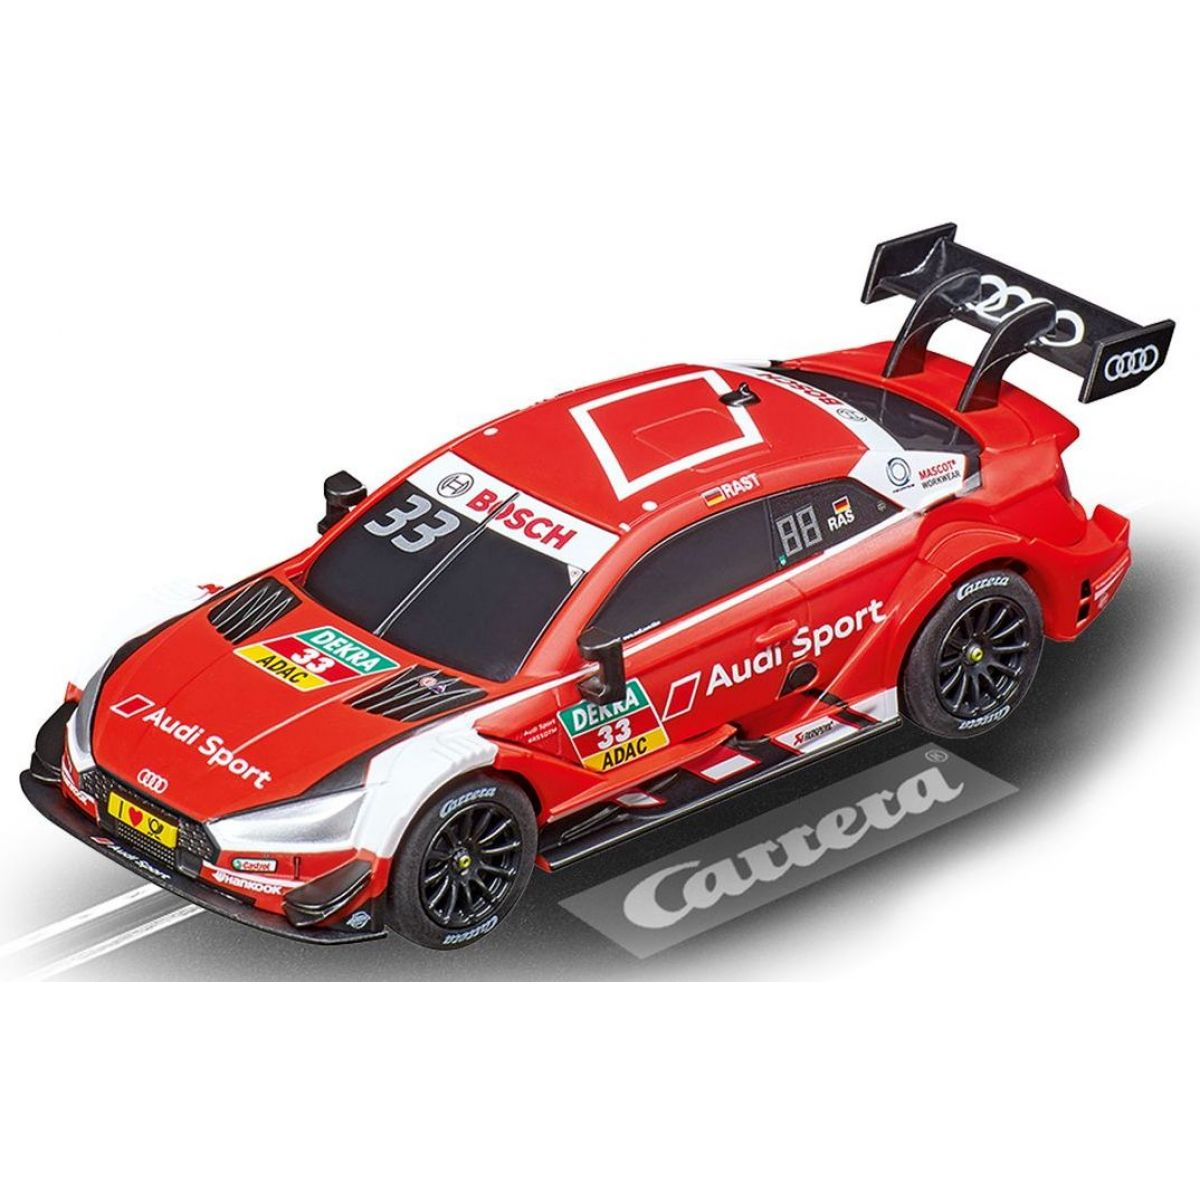 Carrera Auto 64132 Audi RS 5 DTM R.Rast